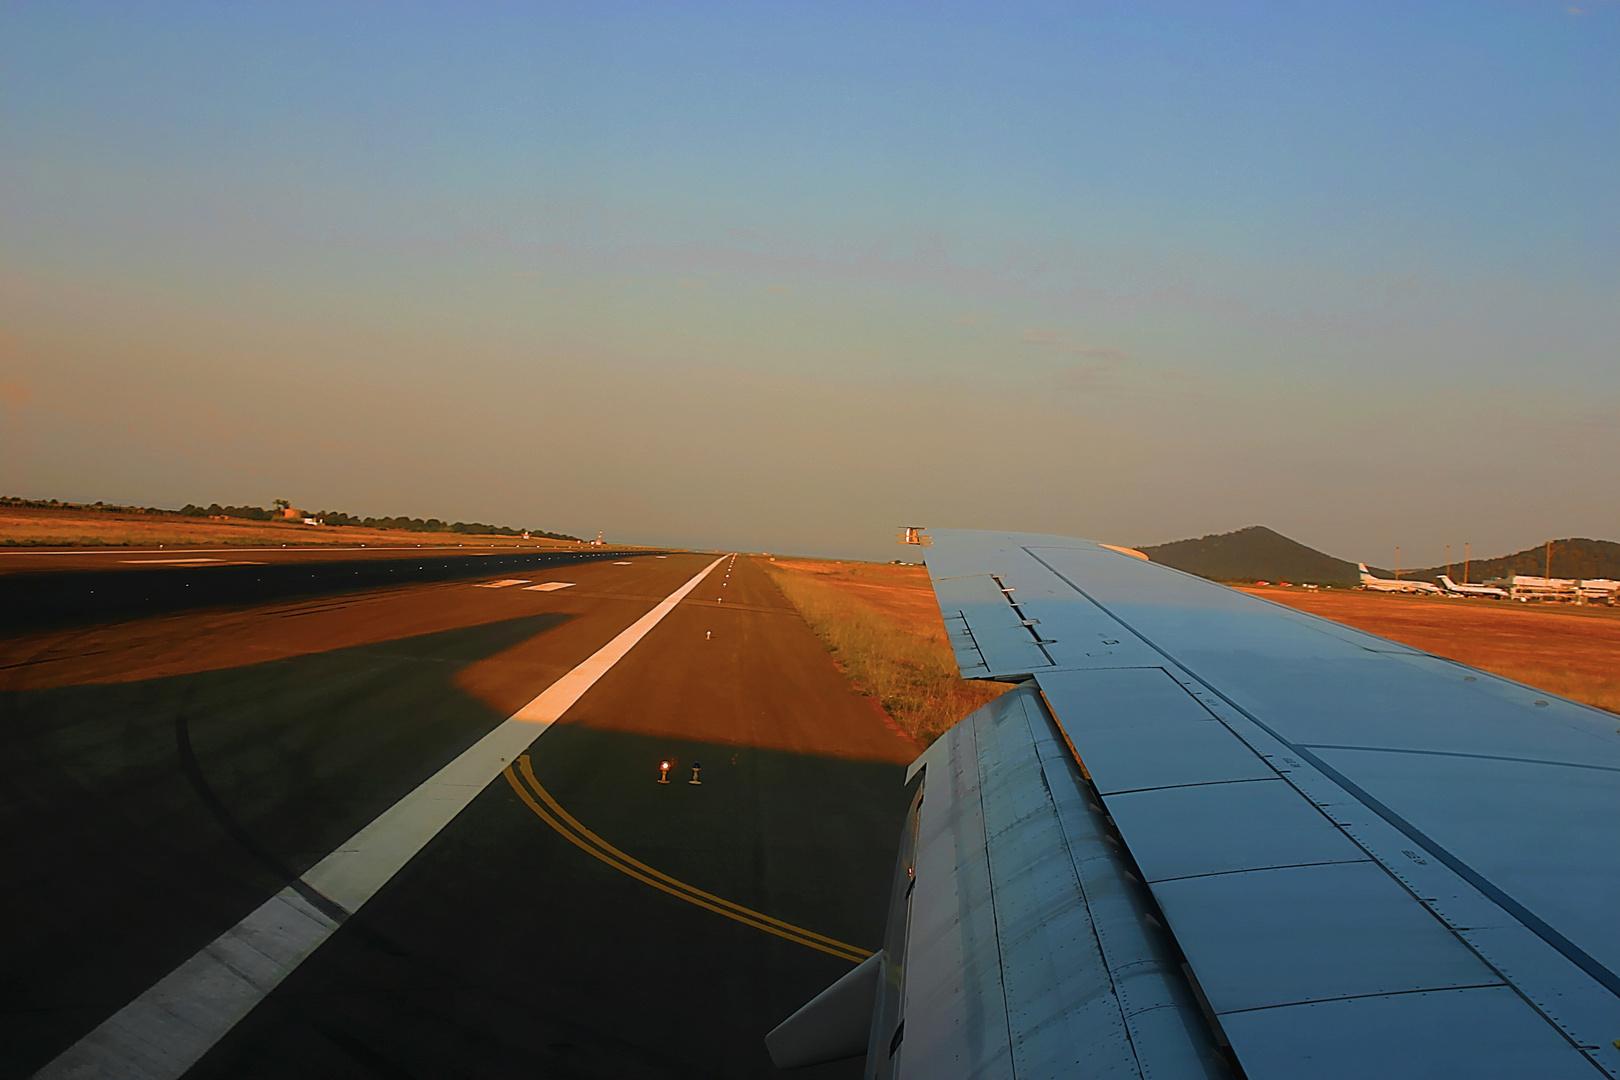 Ibiza Runway Overview